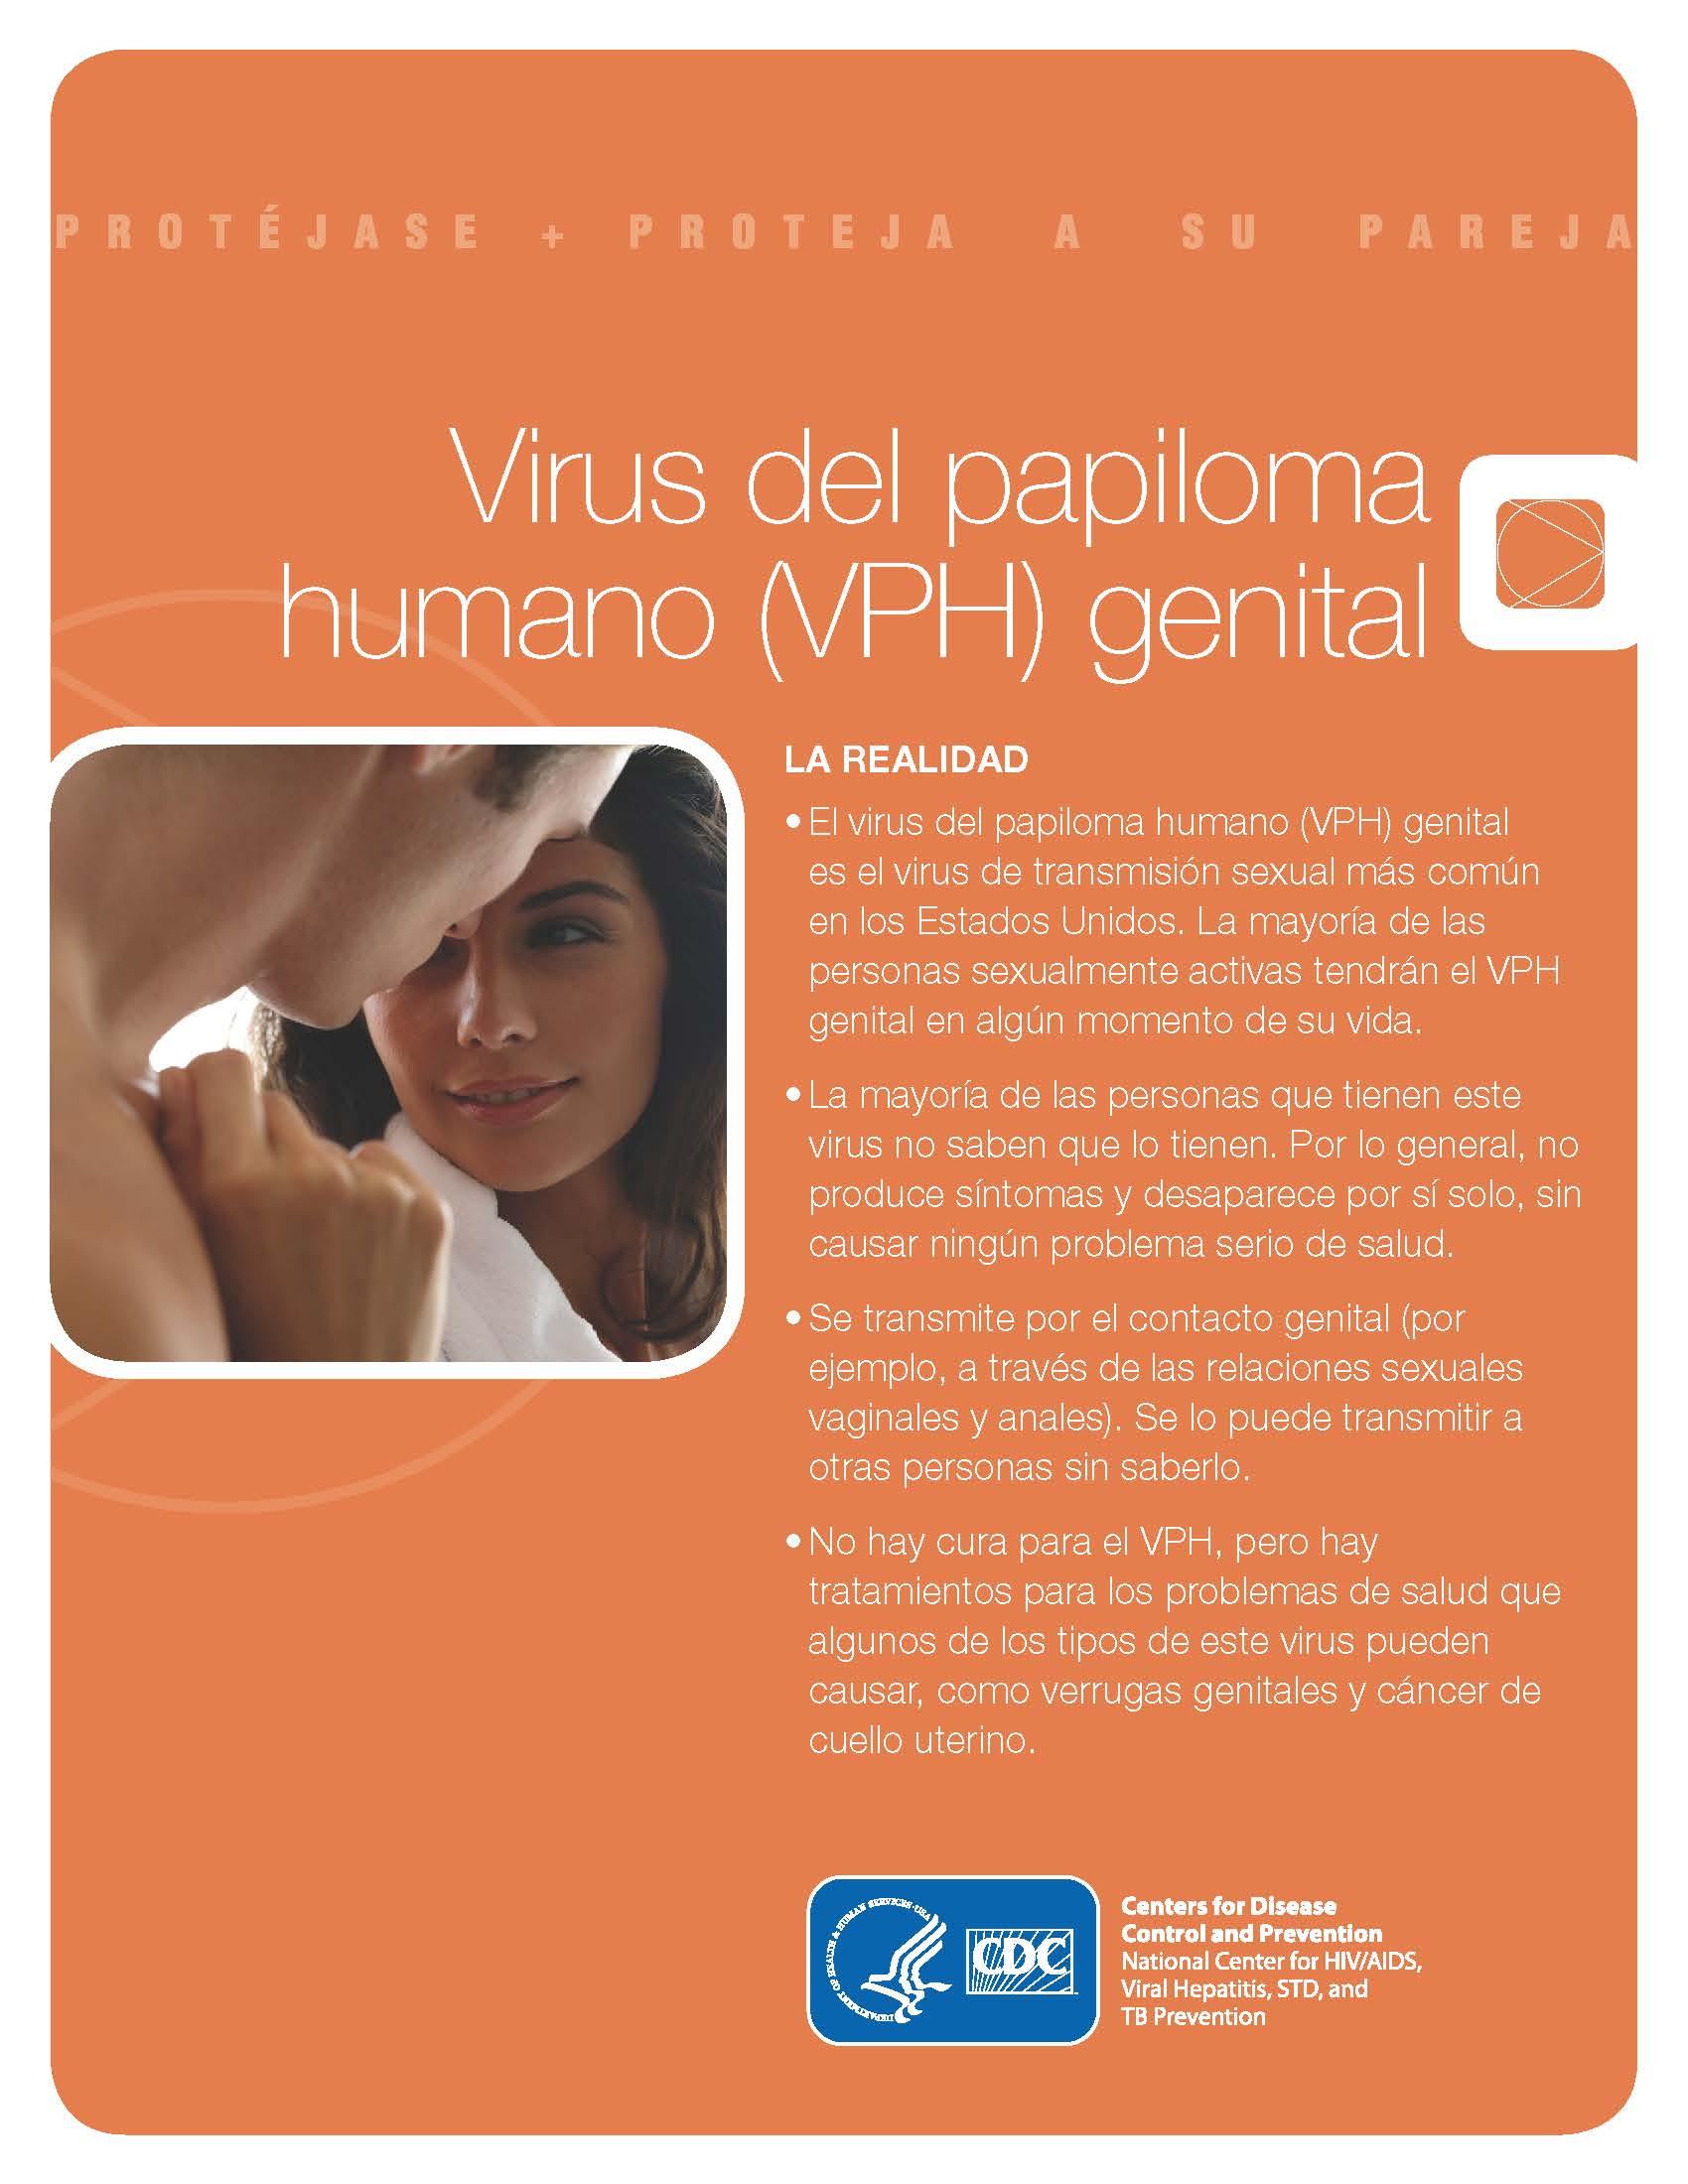 Virus Del Papiloma Humano La Realidad Folleto